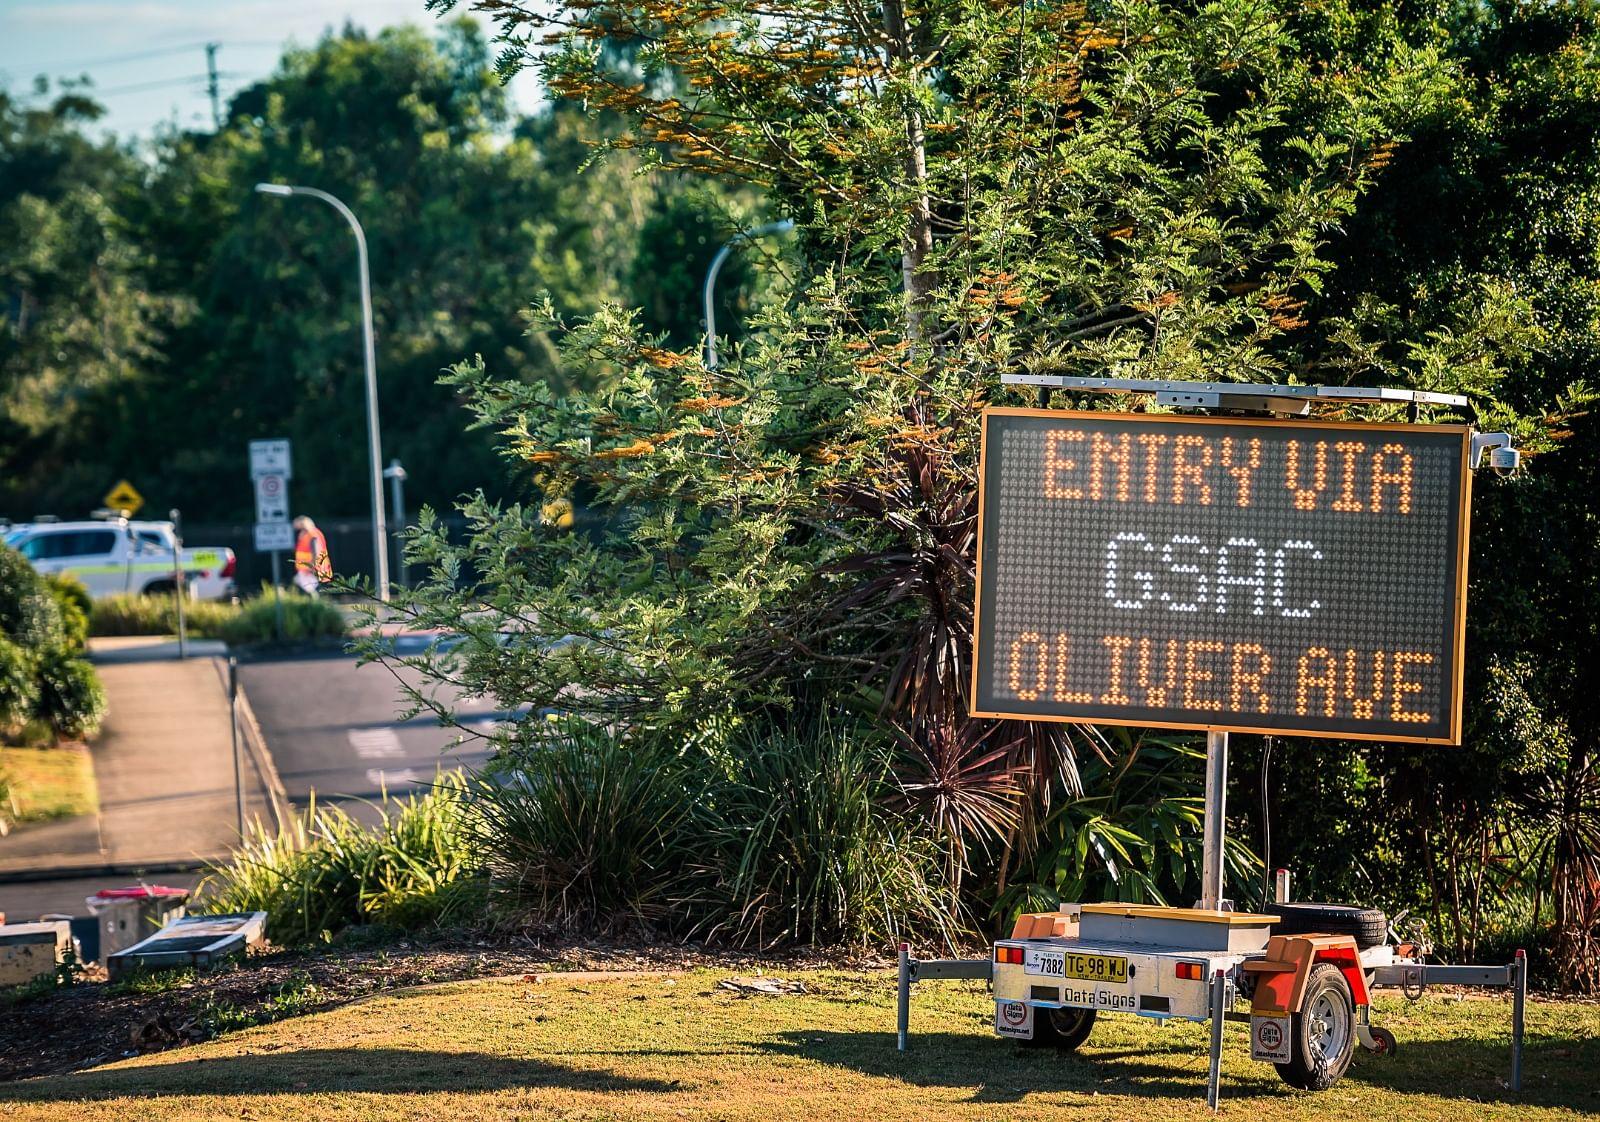 GSAC drive-thru testing to operate on weekend